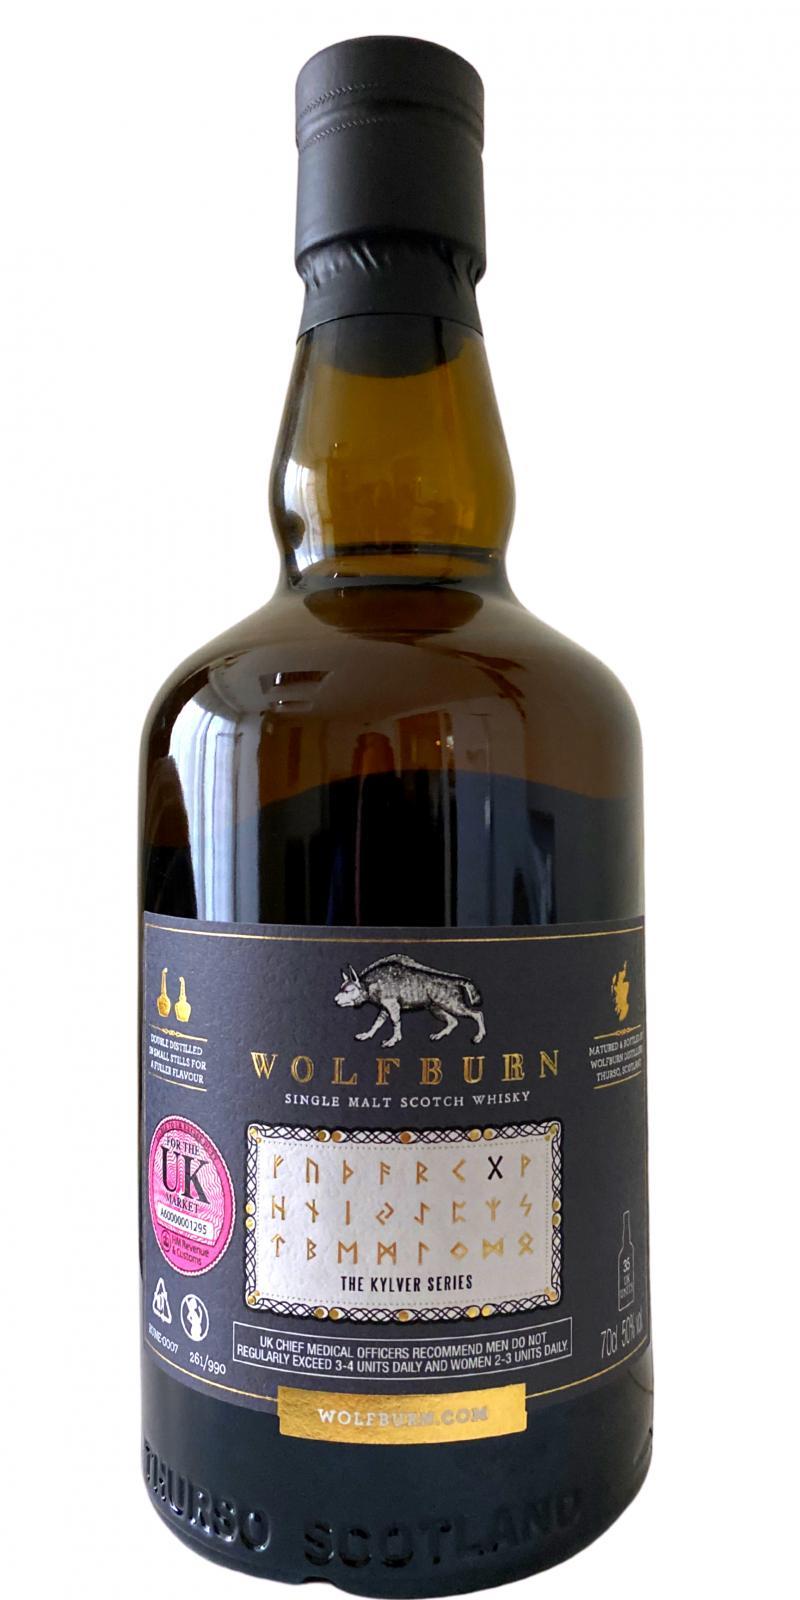 Wolfburn The Kylver Series - 7